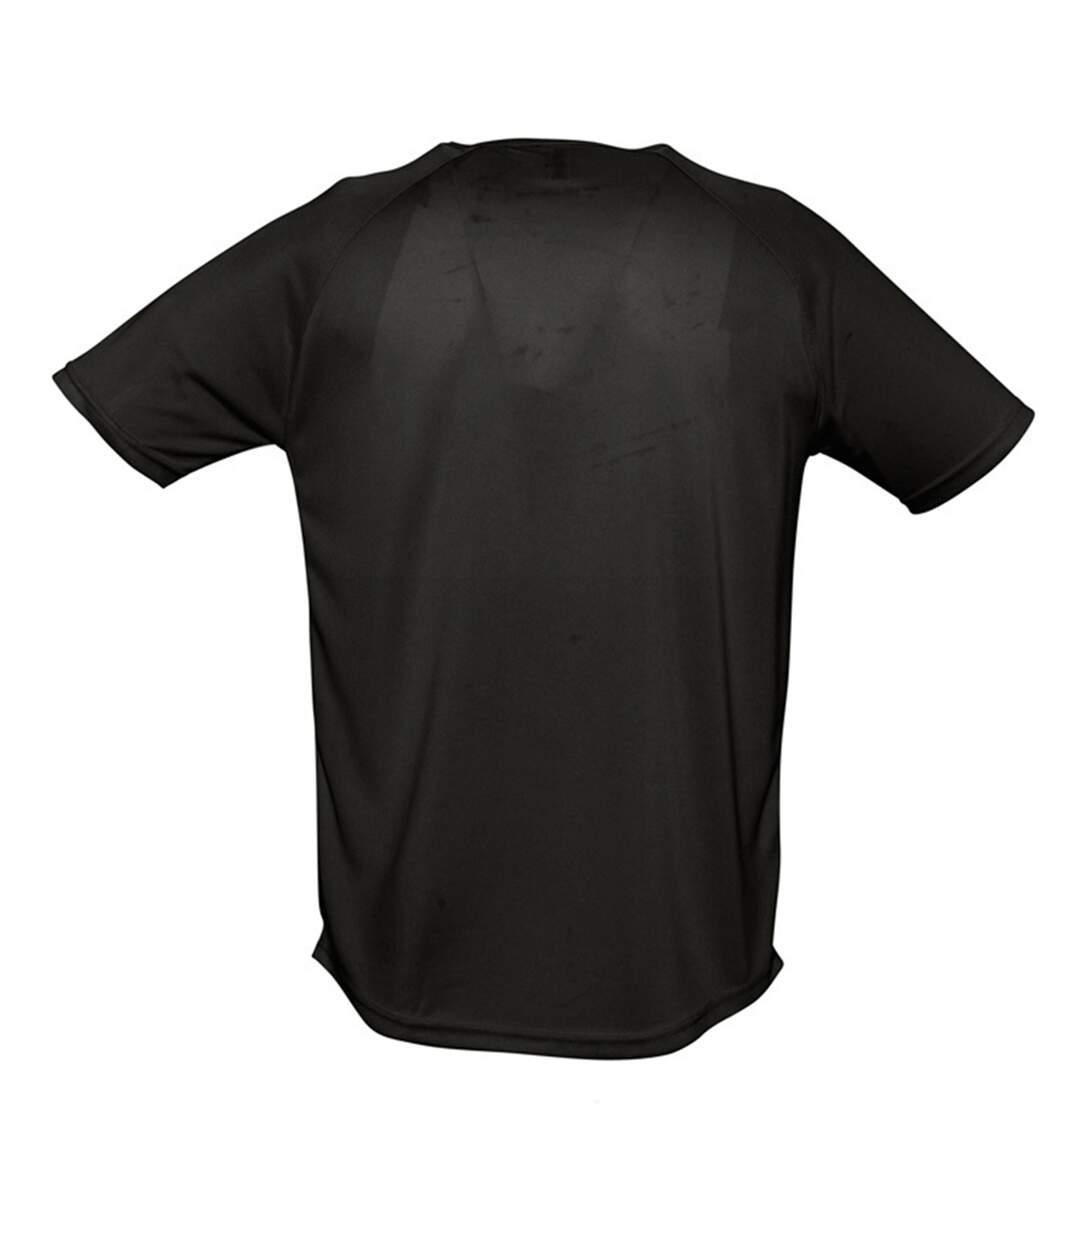 SOLS Mens Sporty Short Sleeve Performance T-Shirt (Black) - UTPC303